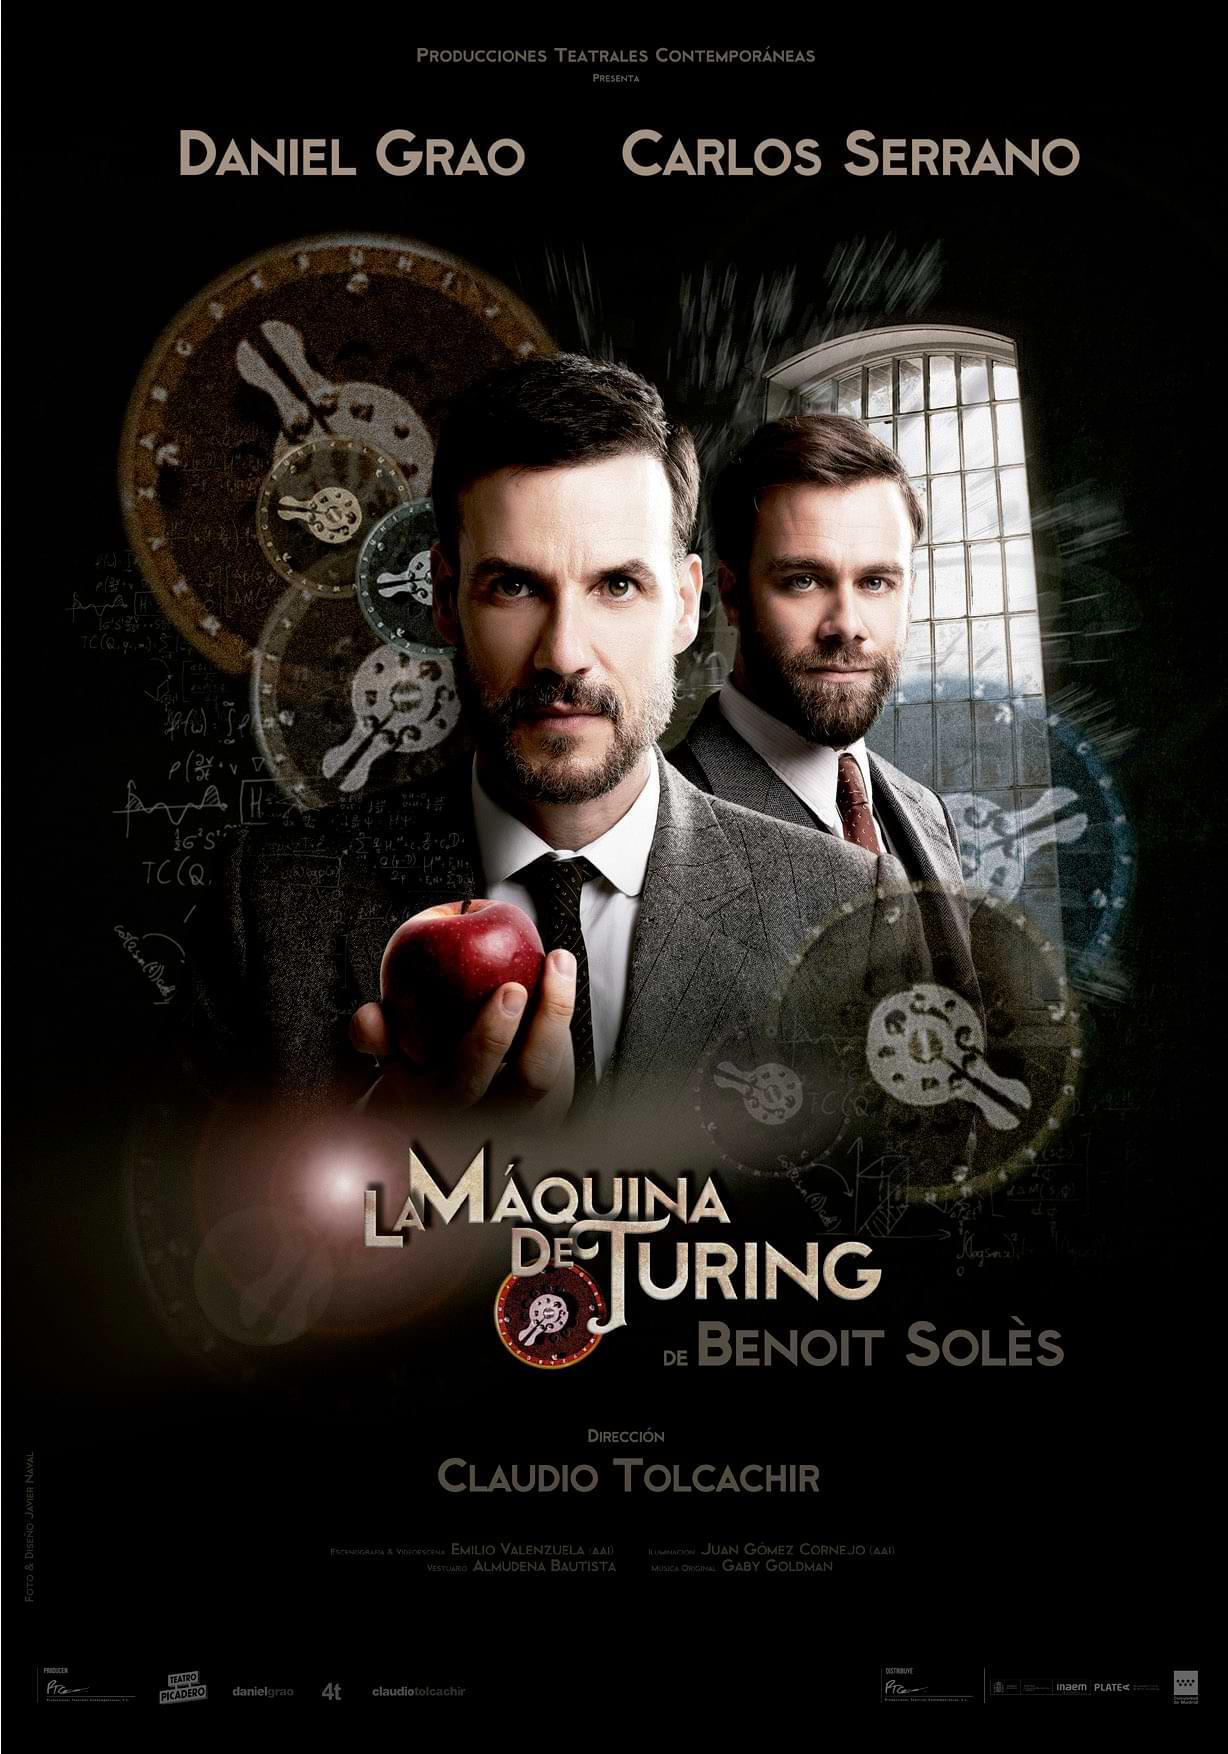 La máquina de Turing Benoit Solés Teatro Carolina Coronado